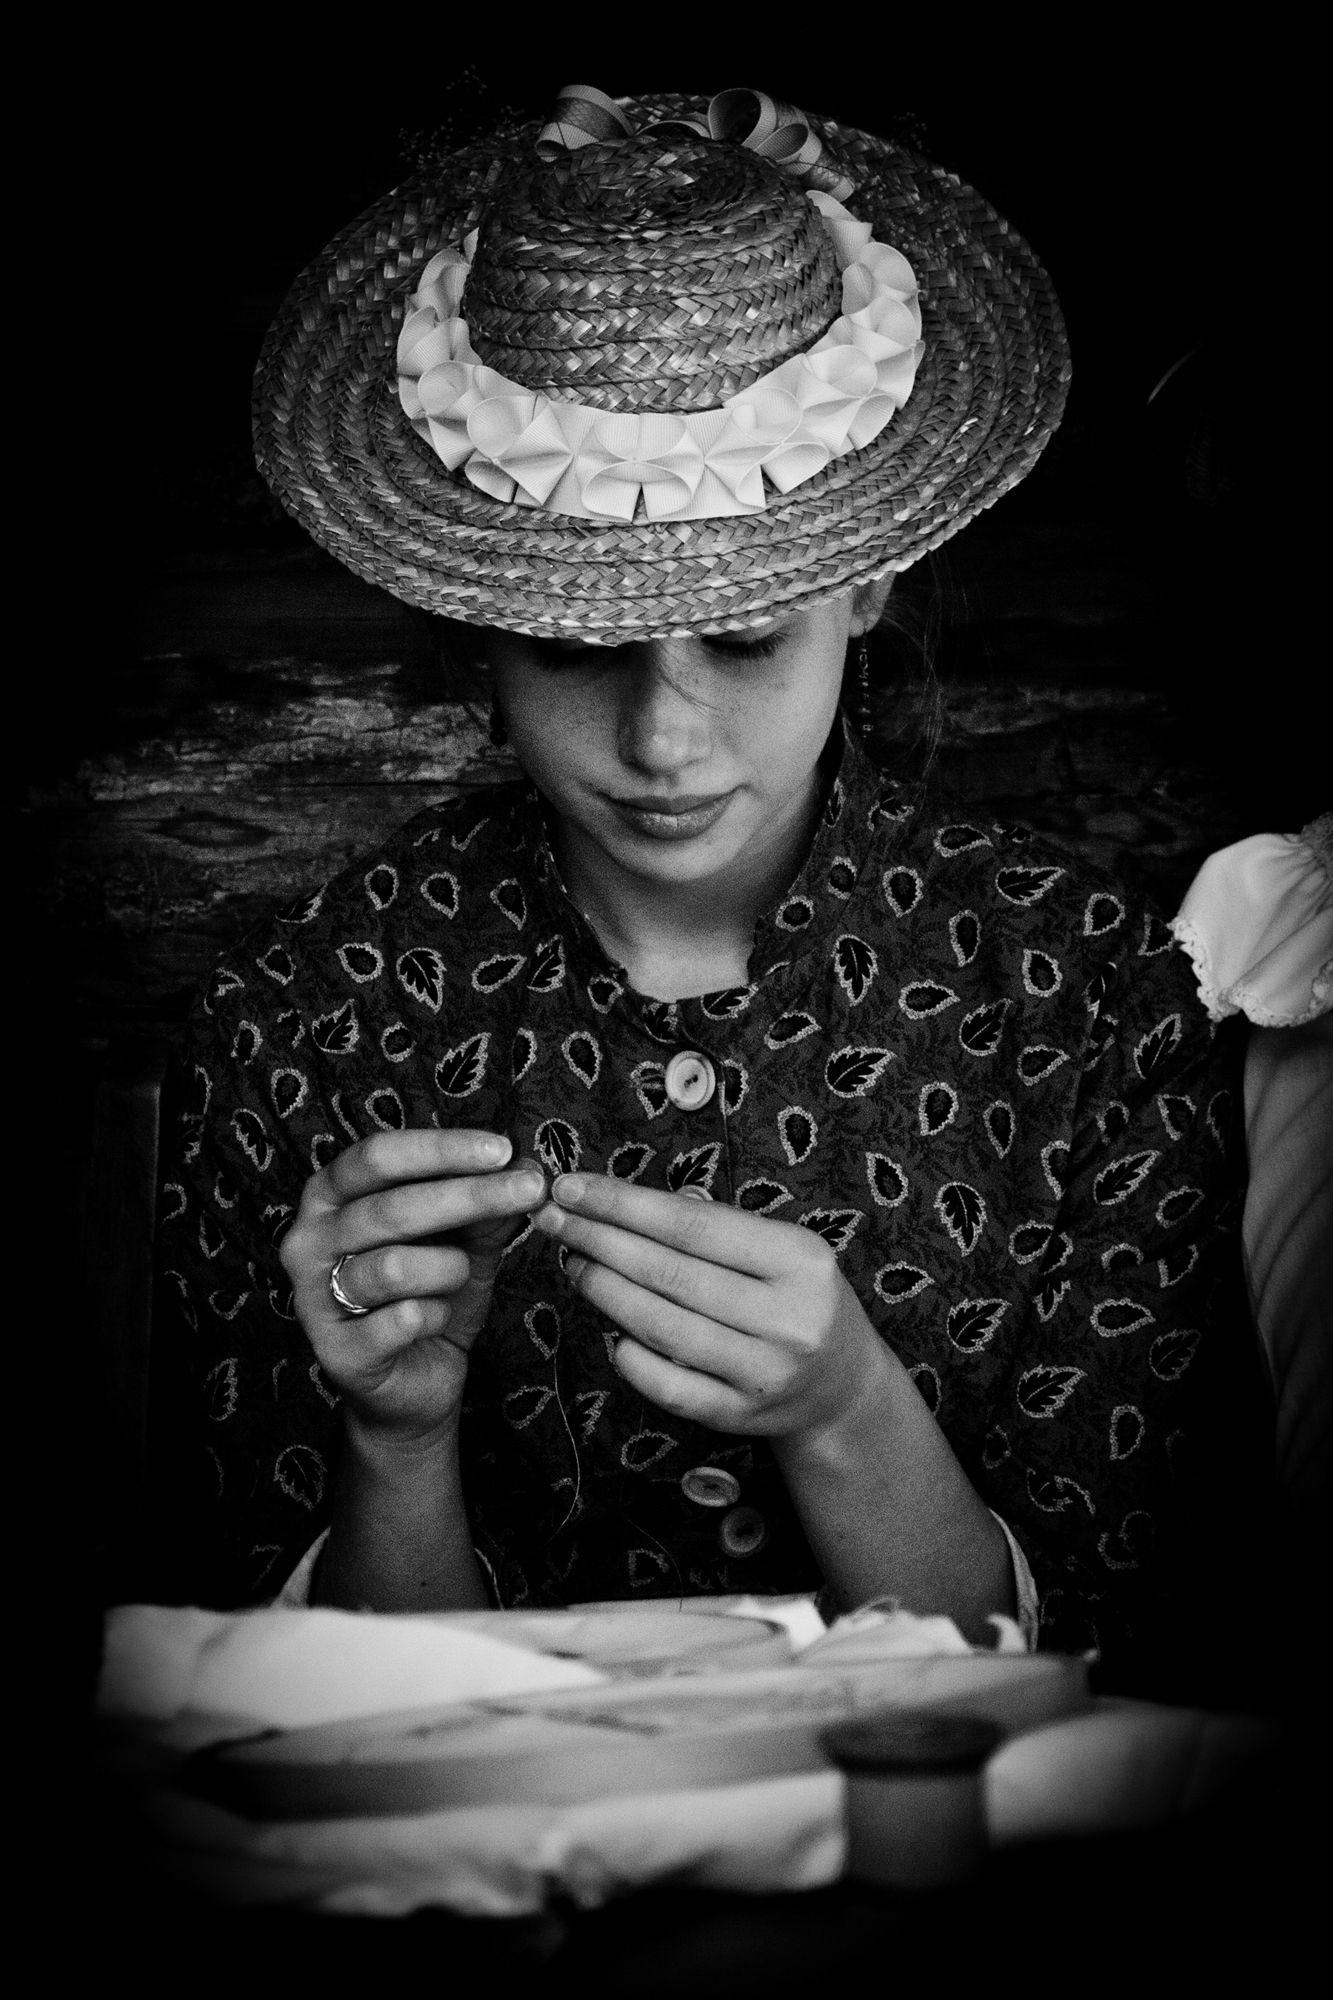 All rights reserved to Ivan Urban Gobbo spazio fotografico©